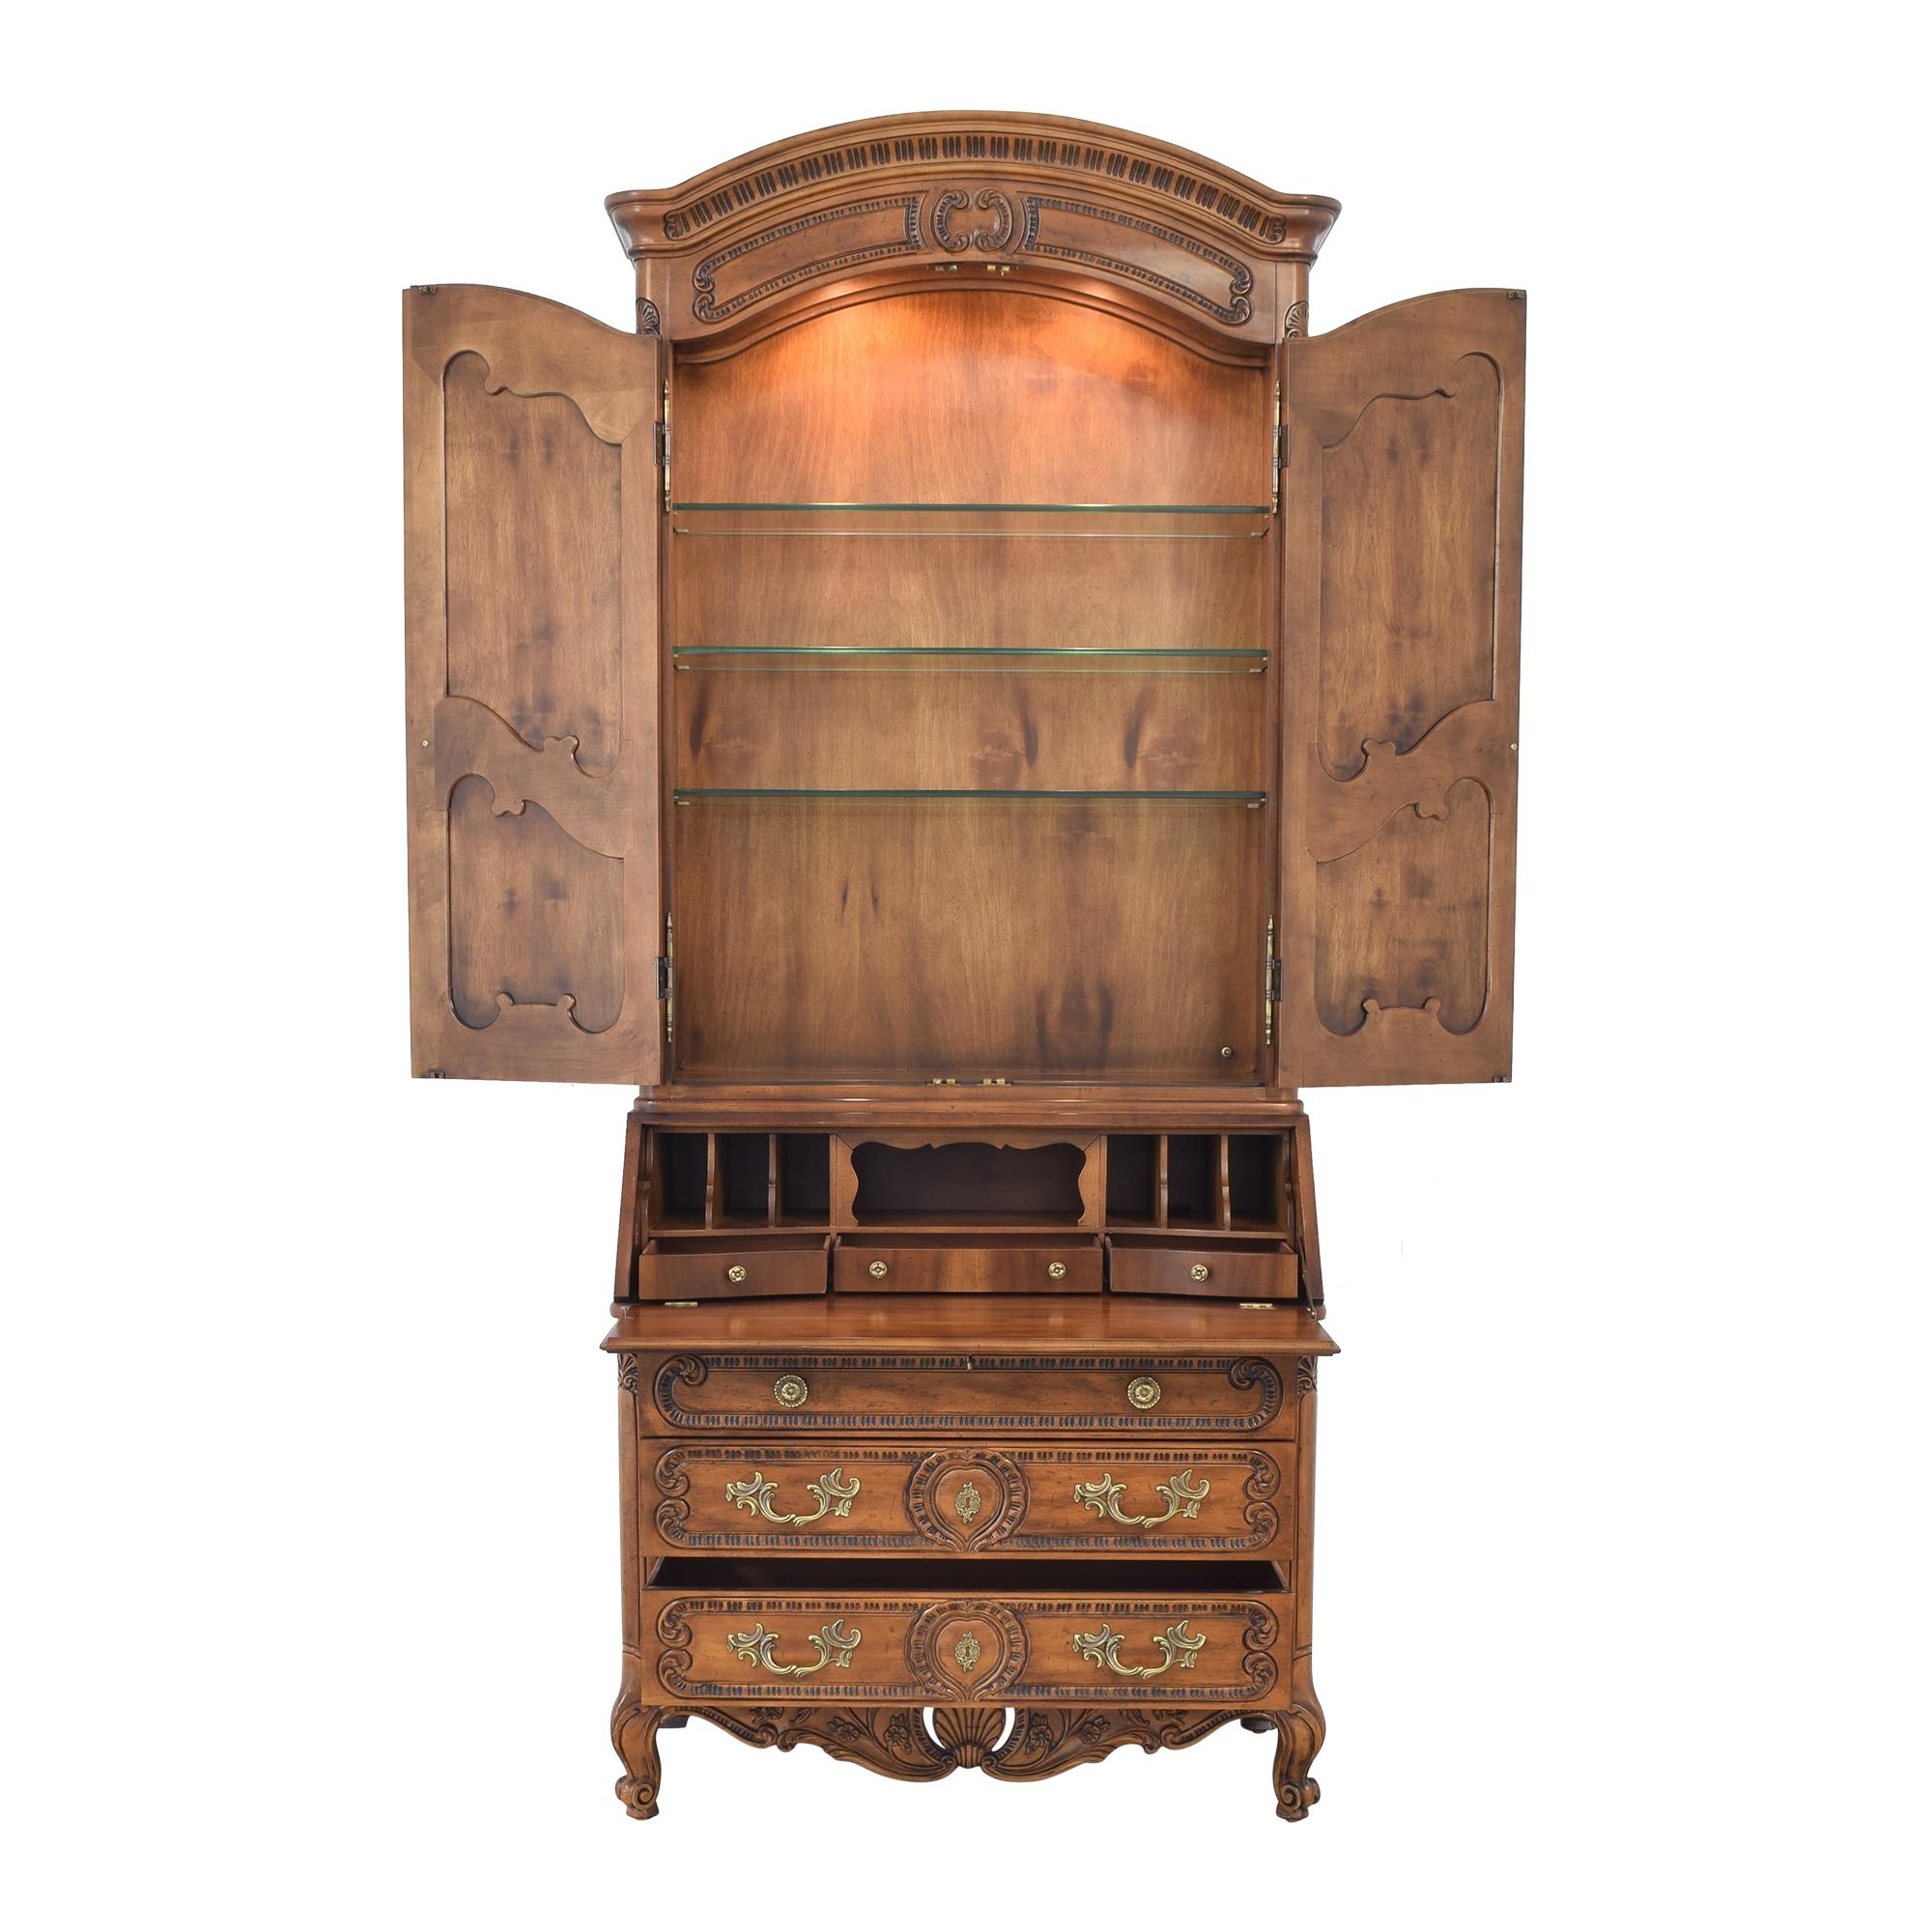 Henredon Furniture Henredon Secretary Cabinet used